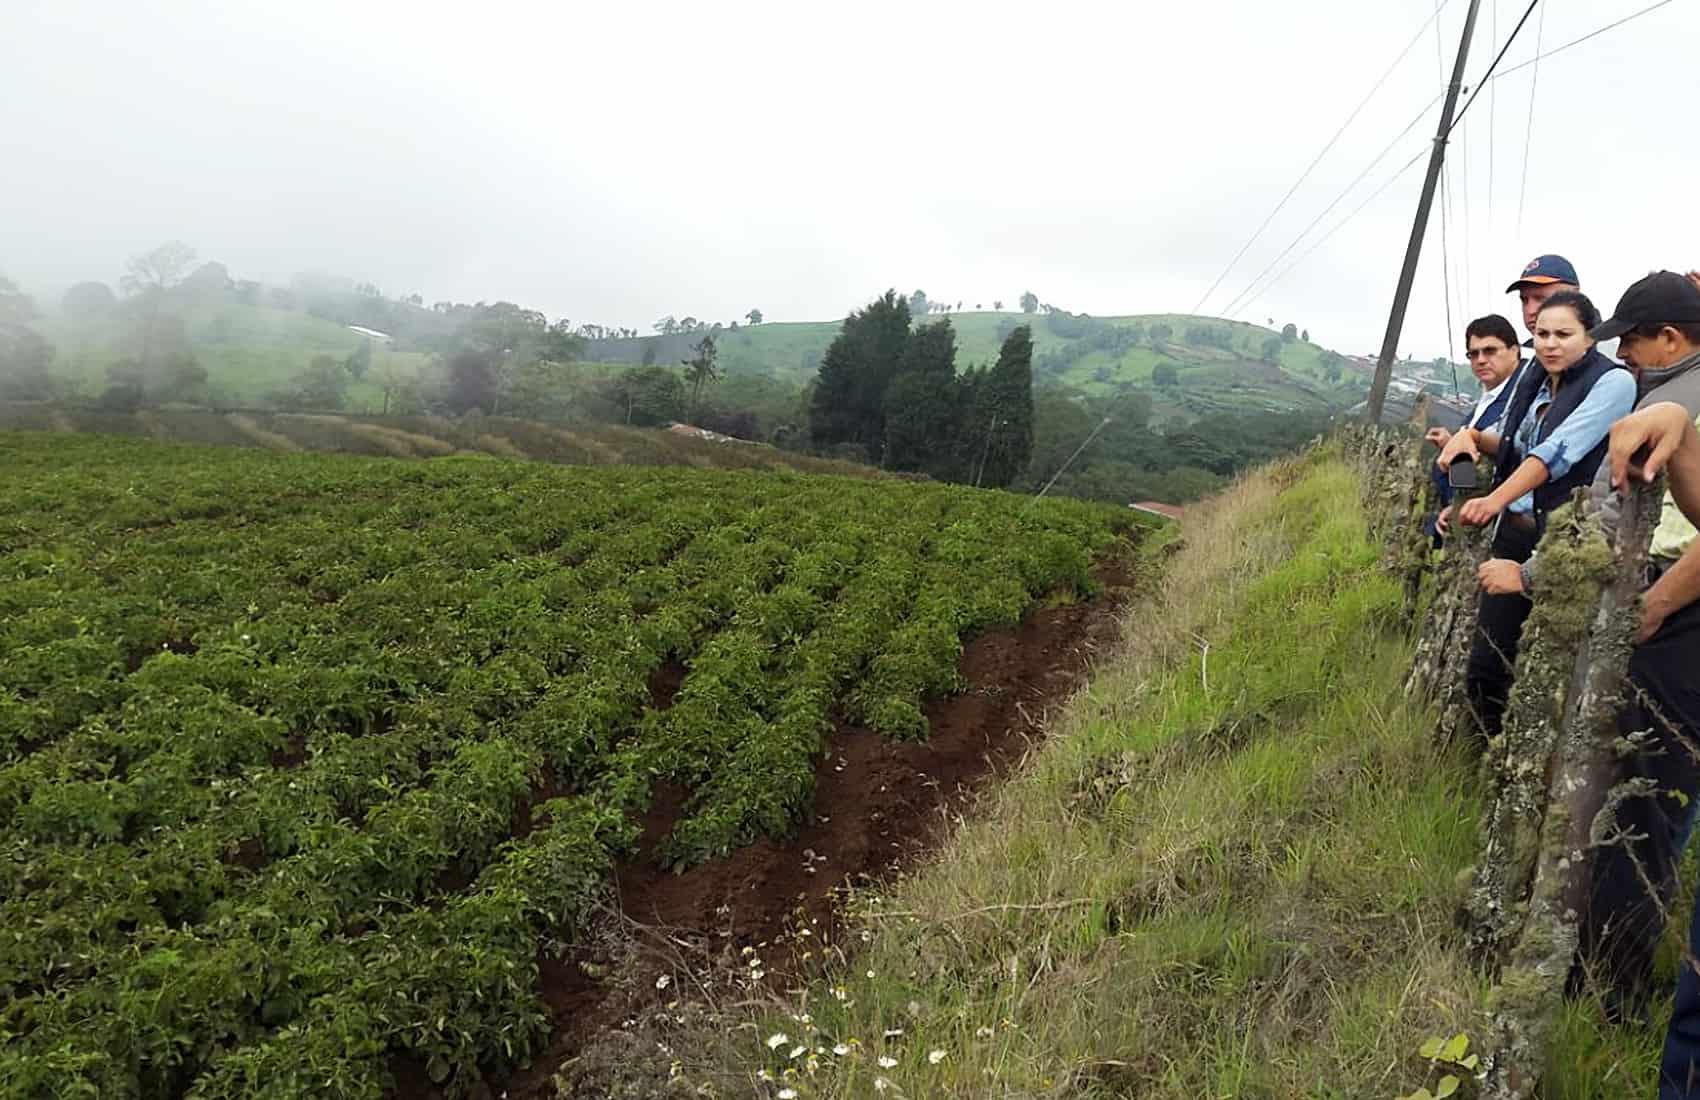 Farms north of Cartago province. May 27, 2016.